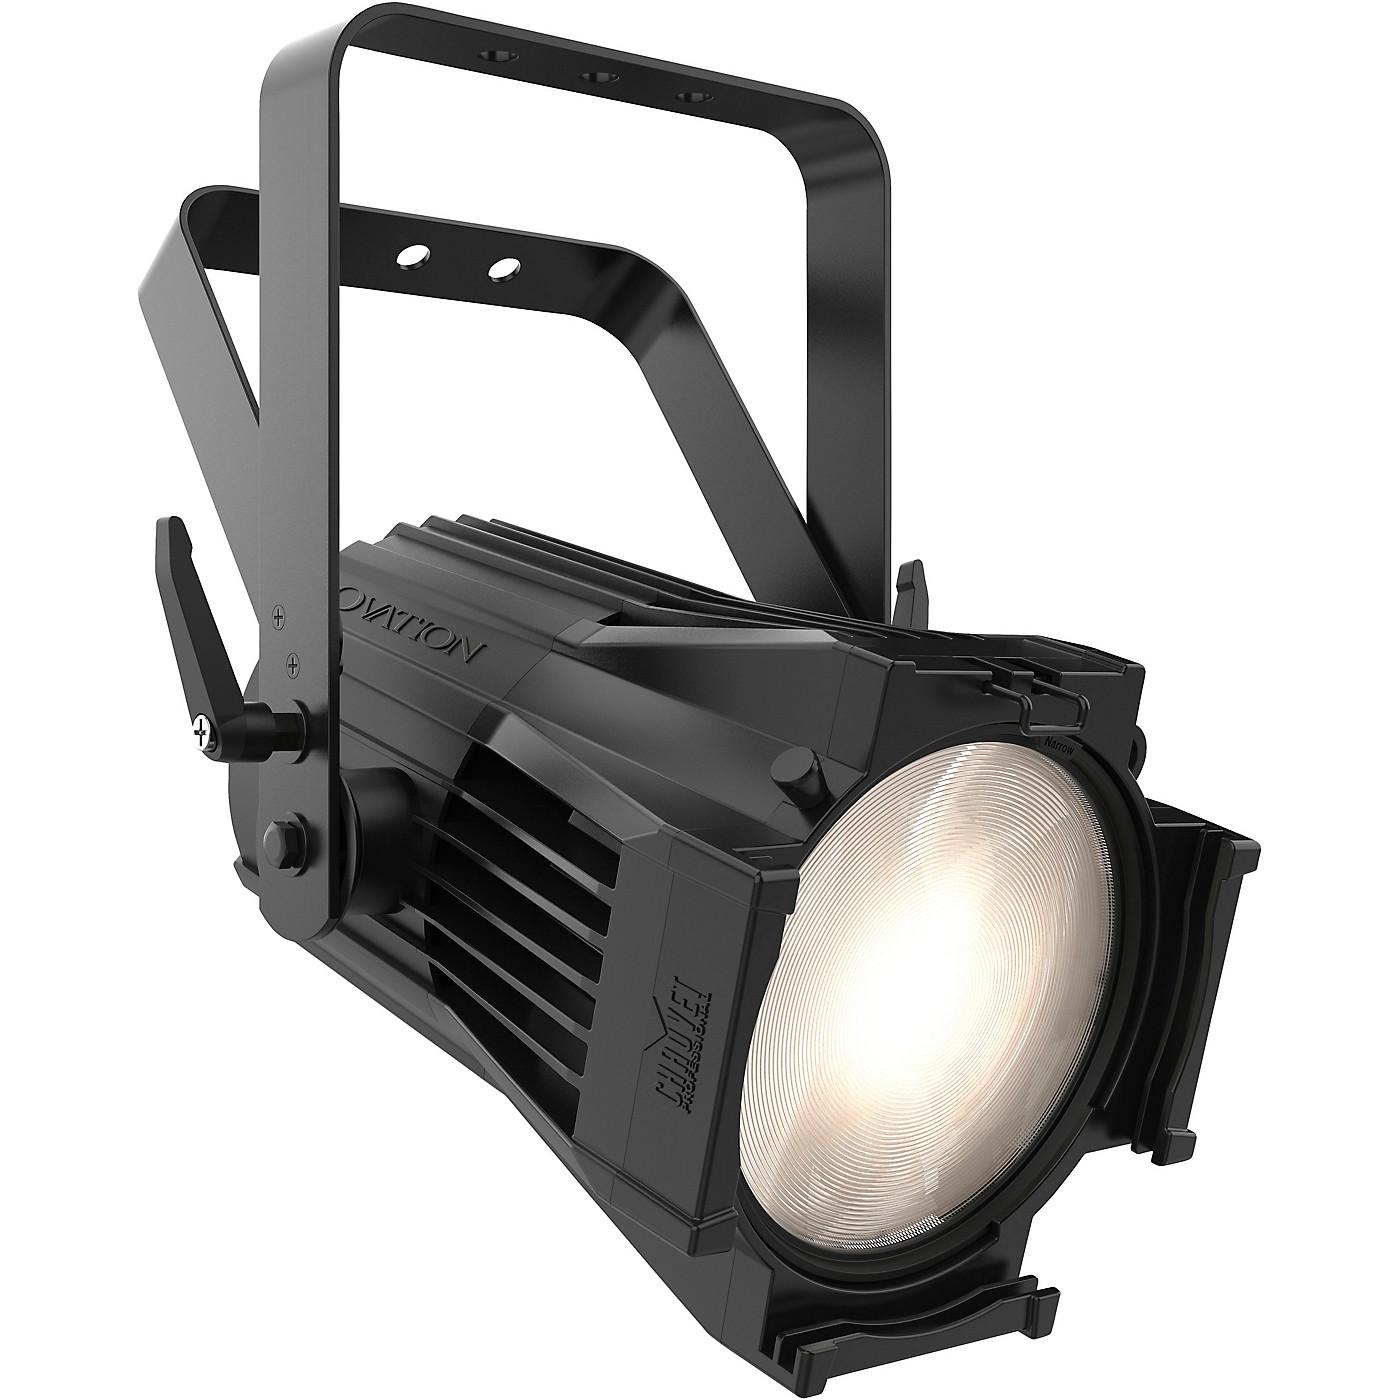 CHAUVET Professional Ovation P-56VW Variable White LED PAR Light thumbnail